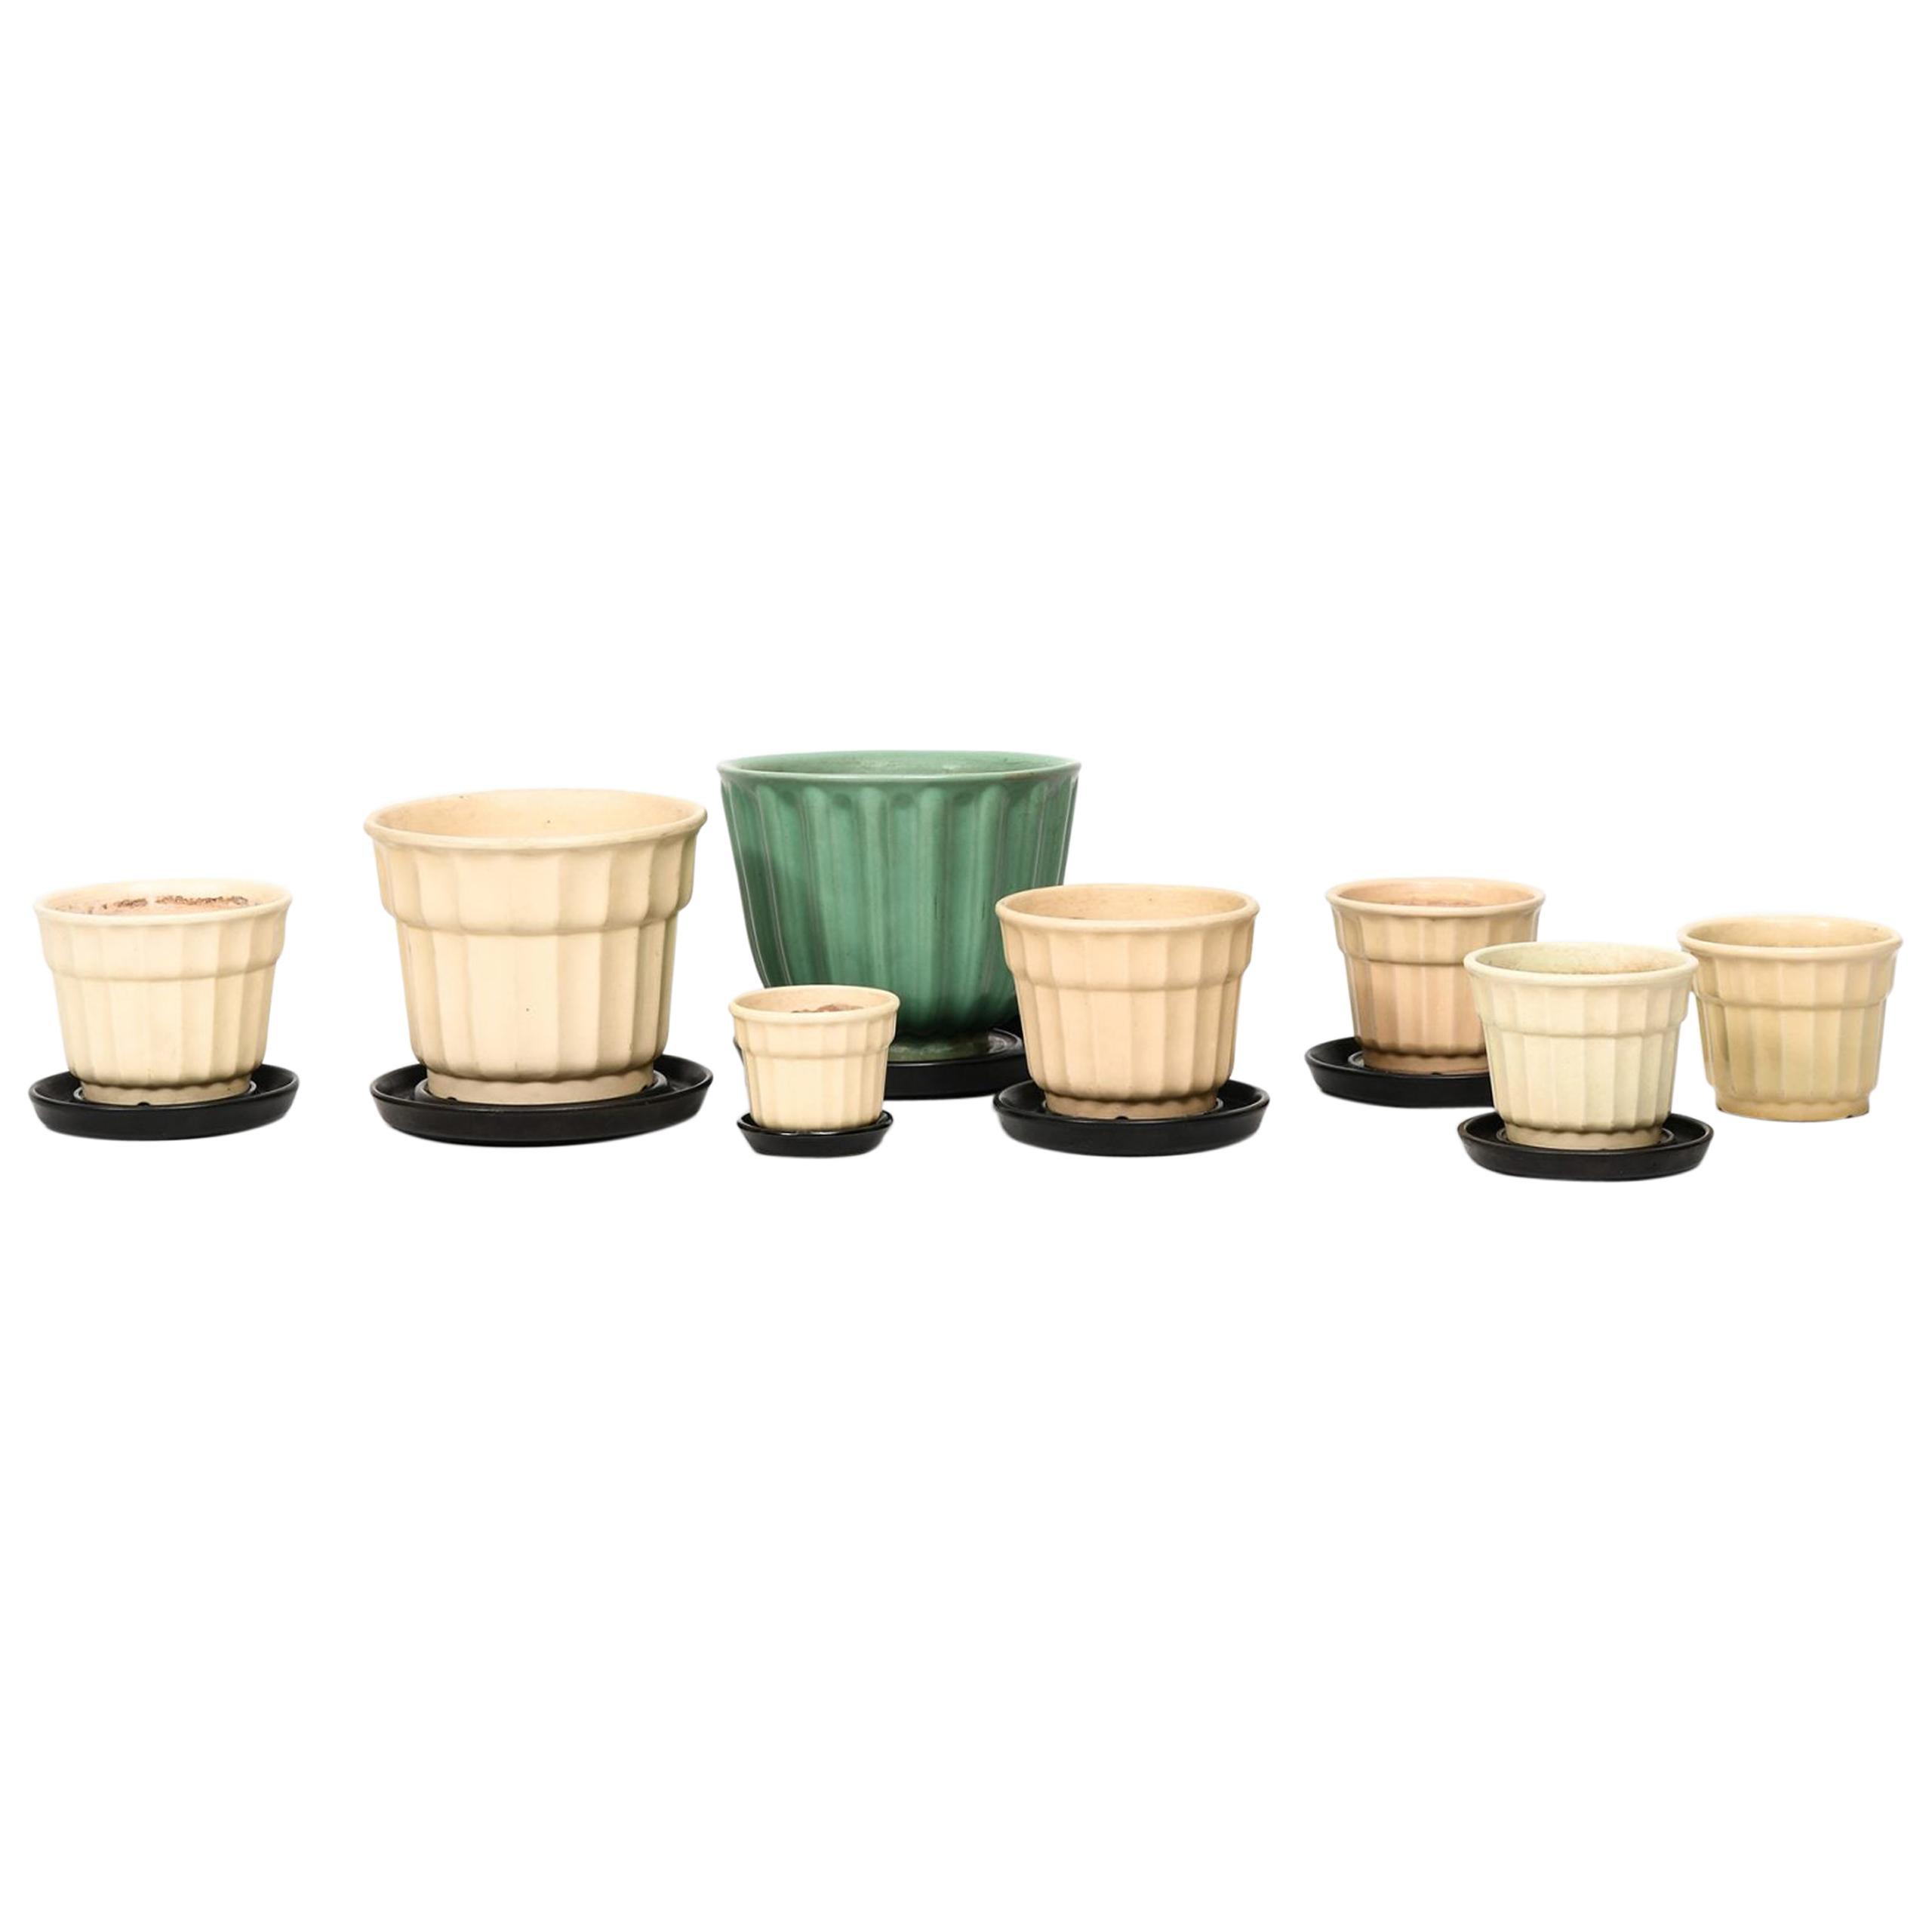 Ewald Dahlskog Vases/Flower Pots Model Tellus by Bobergs Fajansfabrik in Sweden